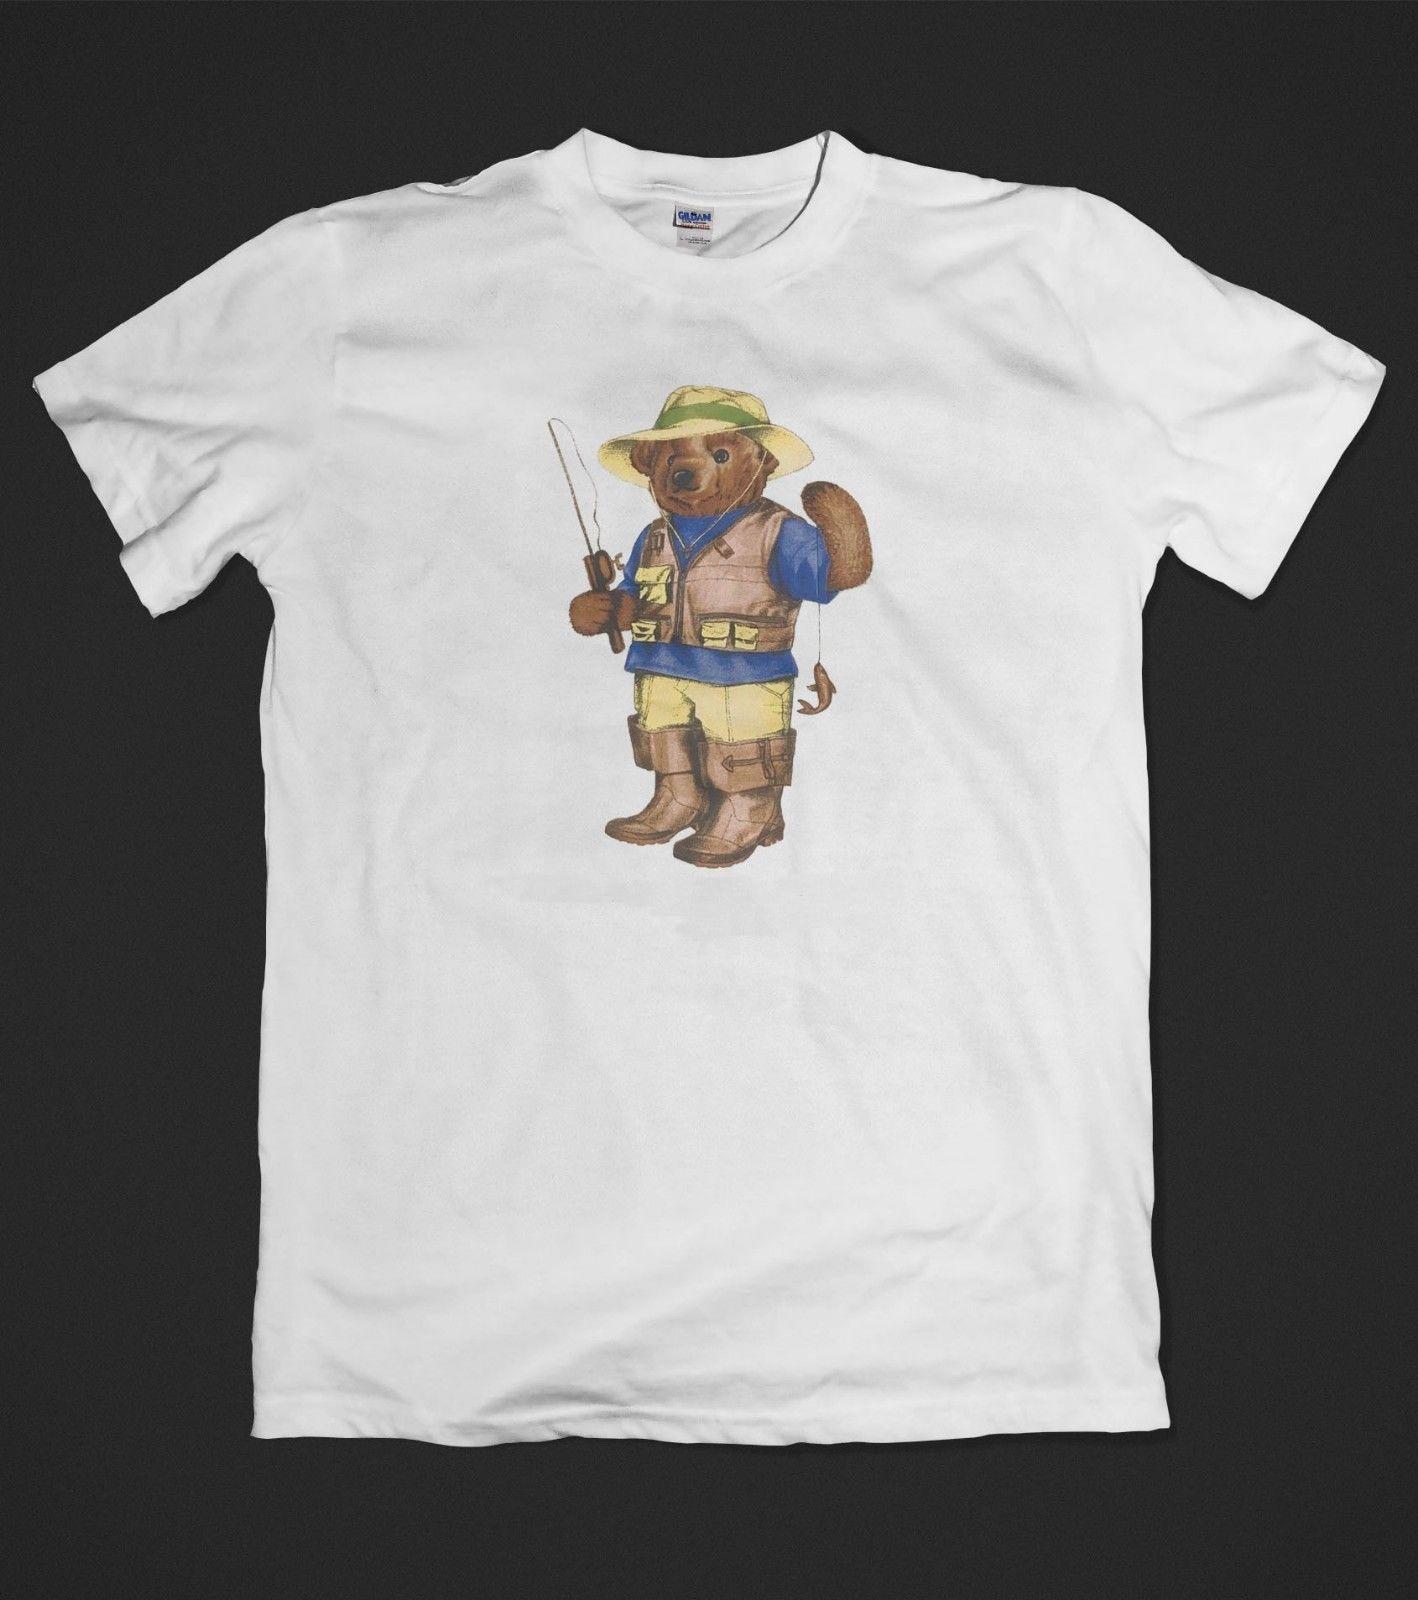 New  T-Shirt Bear Logo Fishing Cotton Short Sleeve S to XXL  Cartoon t shirt men Unisex New Fashion tshirt Футболка